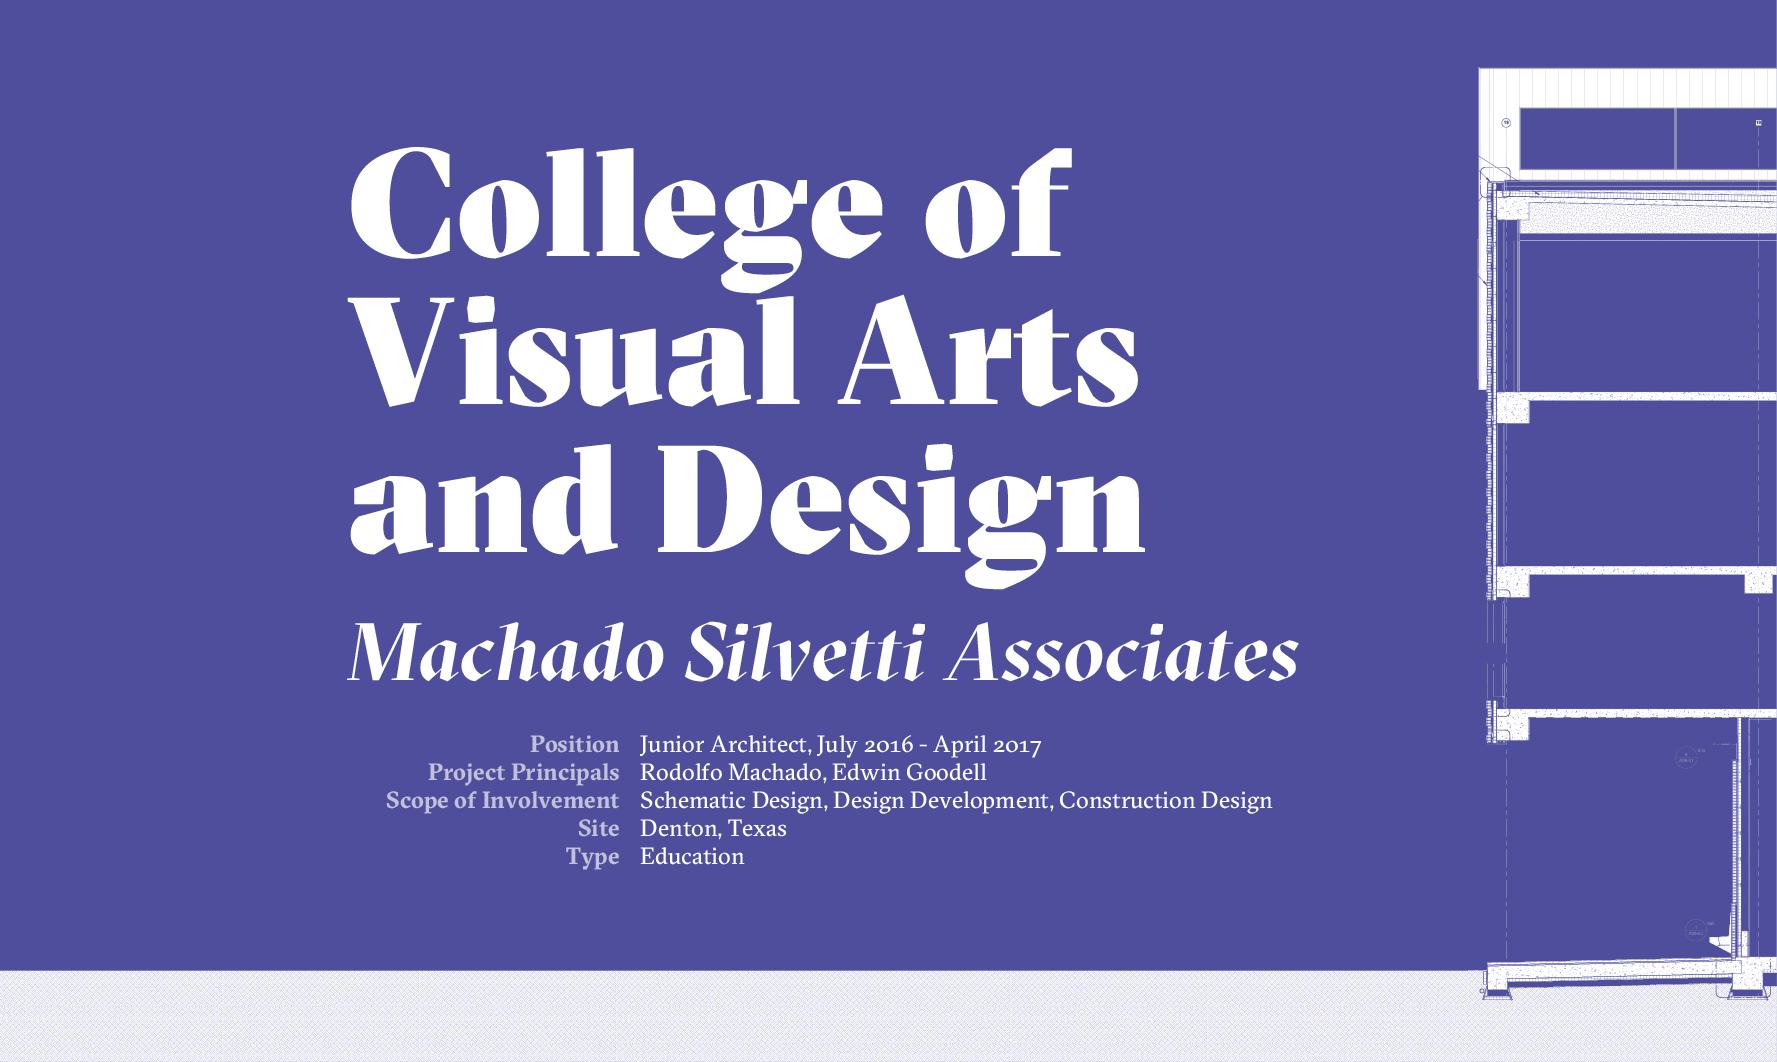 images?q=tbn:ANd9GcQh_l3eQ5xwiPy07kGEXjmjgmBKBRB7H2mRxCGhv1tFWg5c_mWT Best Of Unt College Of Visual Arts And Design @koolgadgetz.com.info